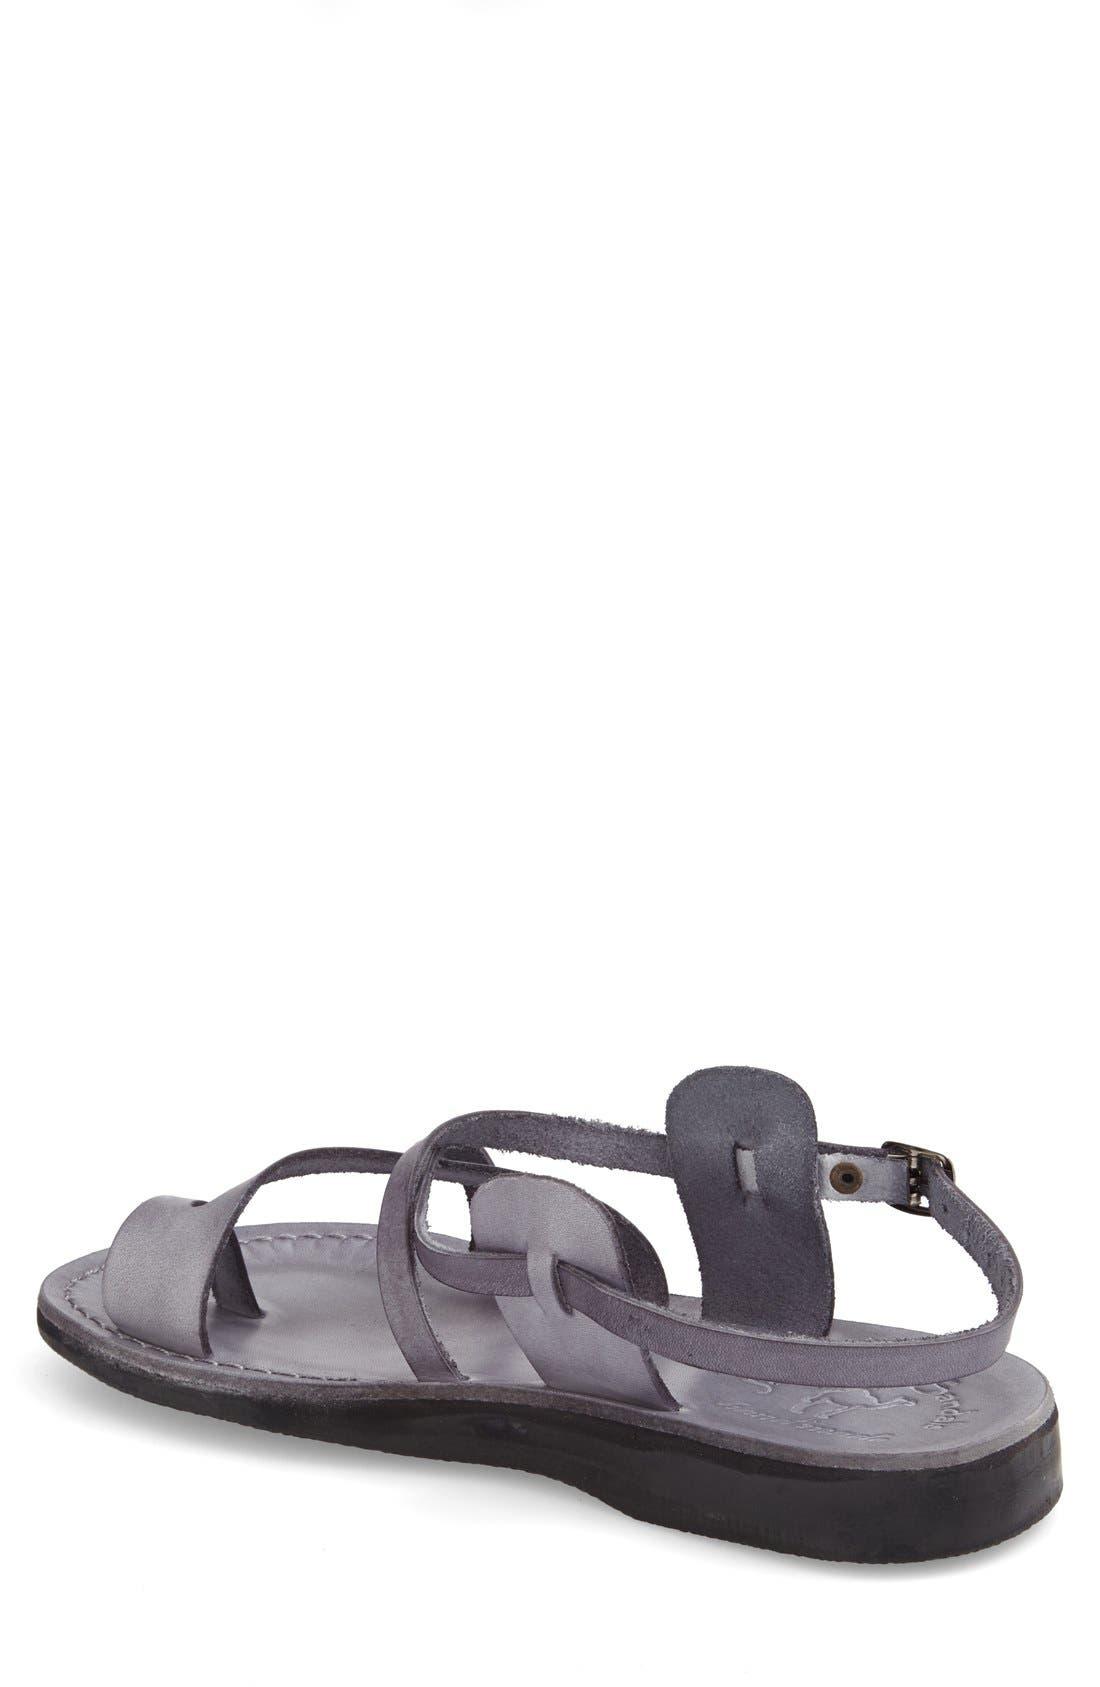 Alternate Image 2  - Jerusalem Sandals 'The Good Shepherd' Leather Sandal (Men)